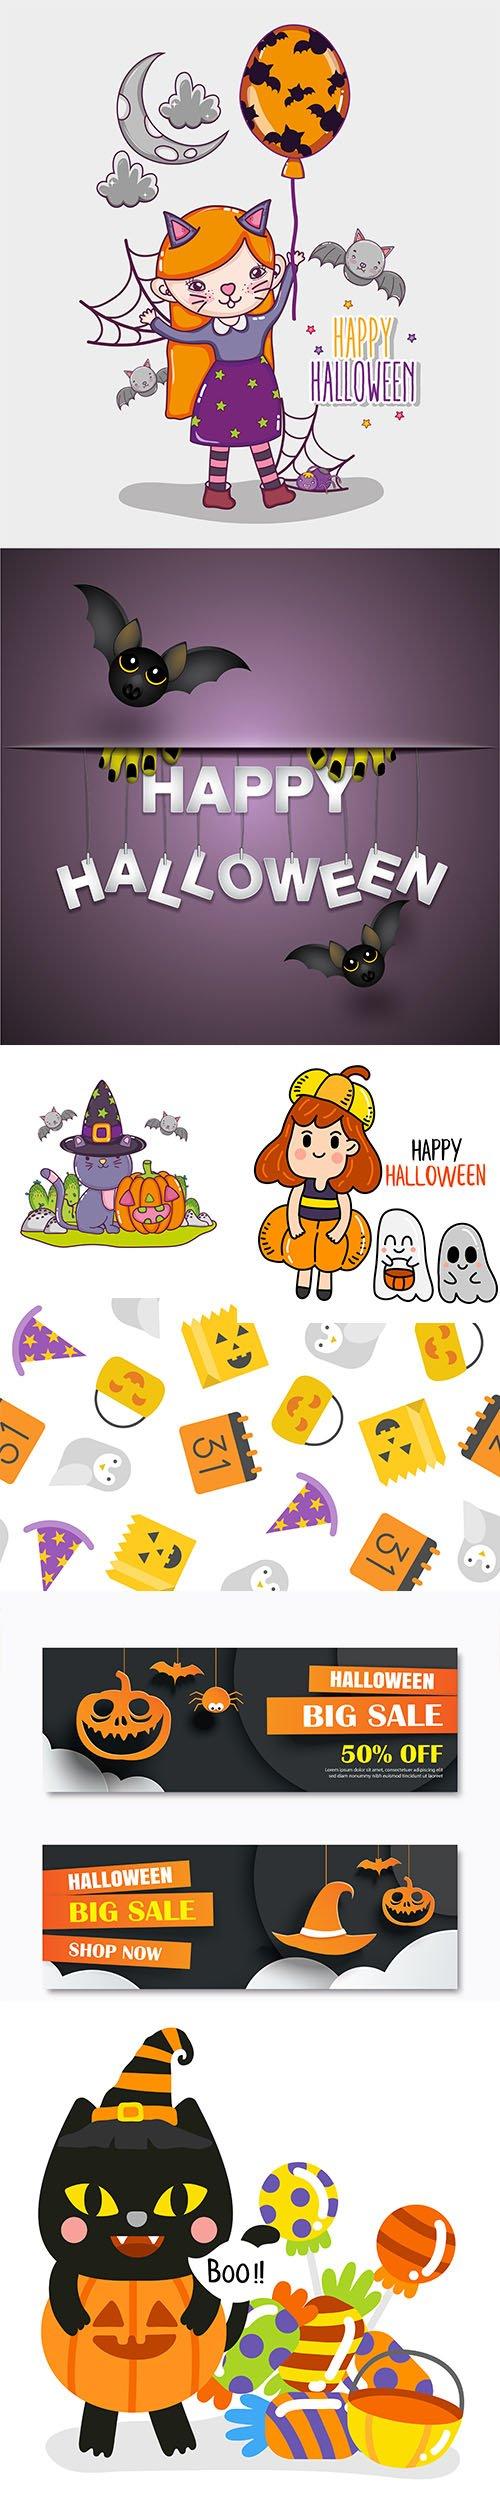 Happy Halloween Illustration Vector Set +Bonus Social Banner and Halloween Pattern